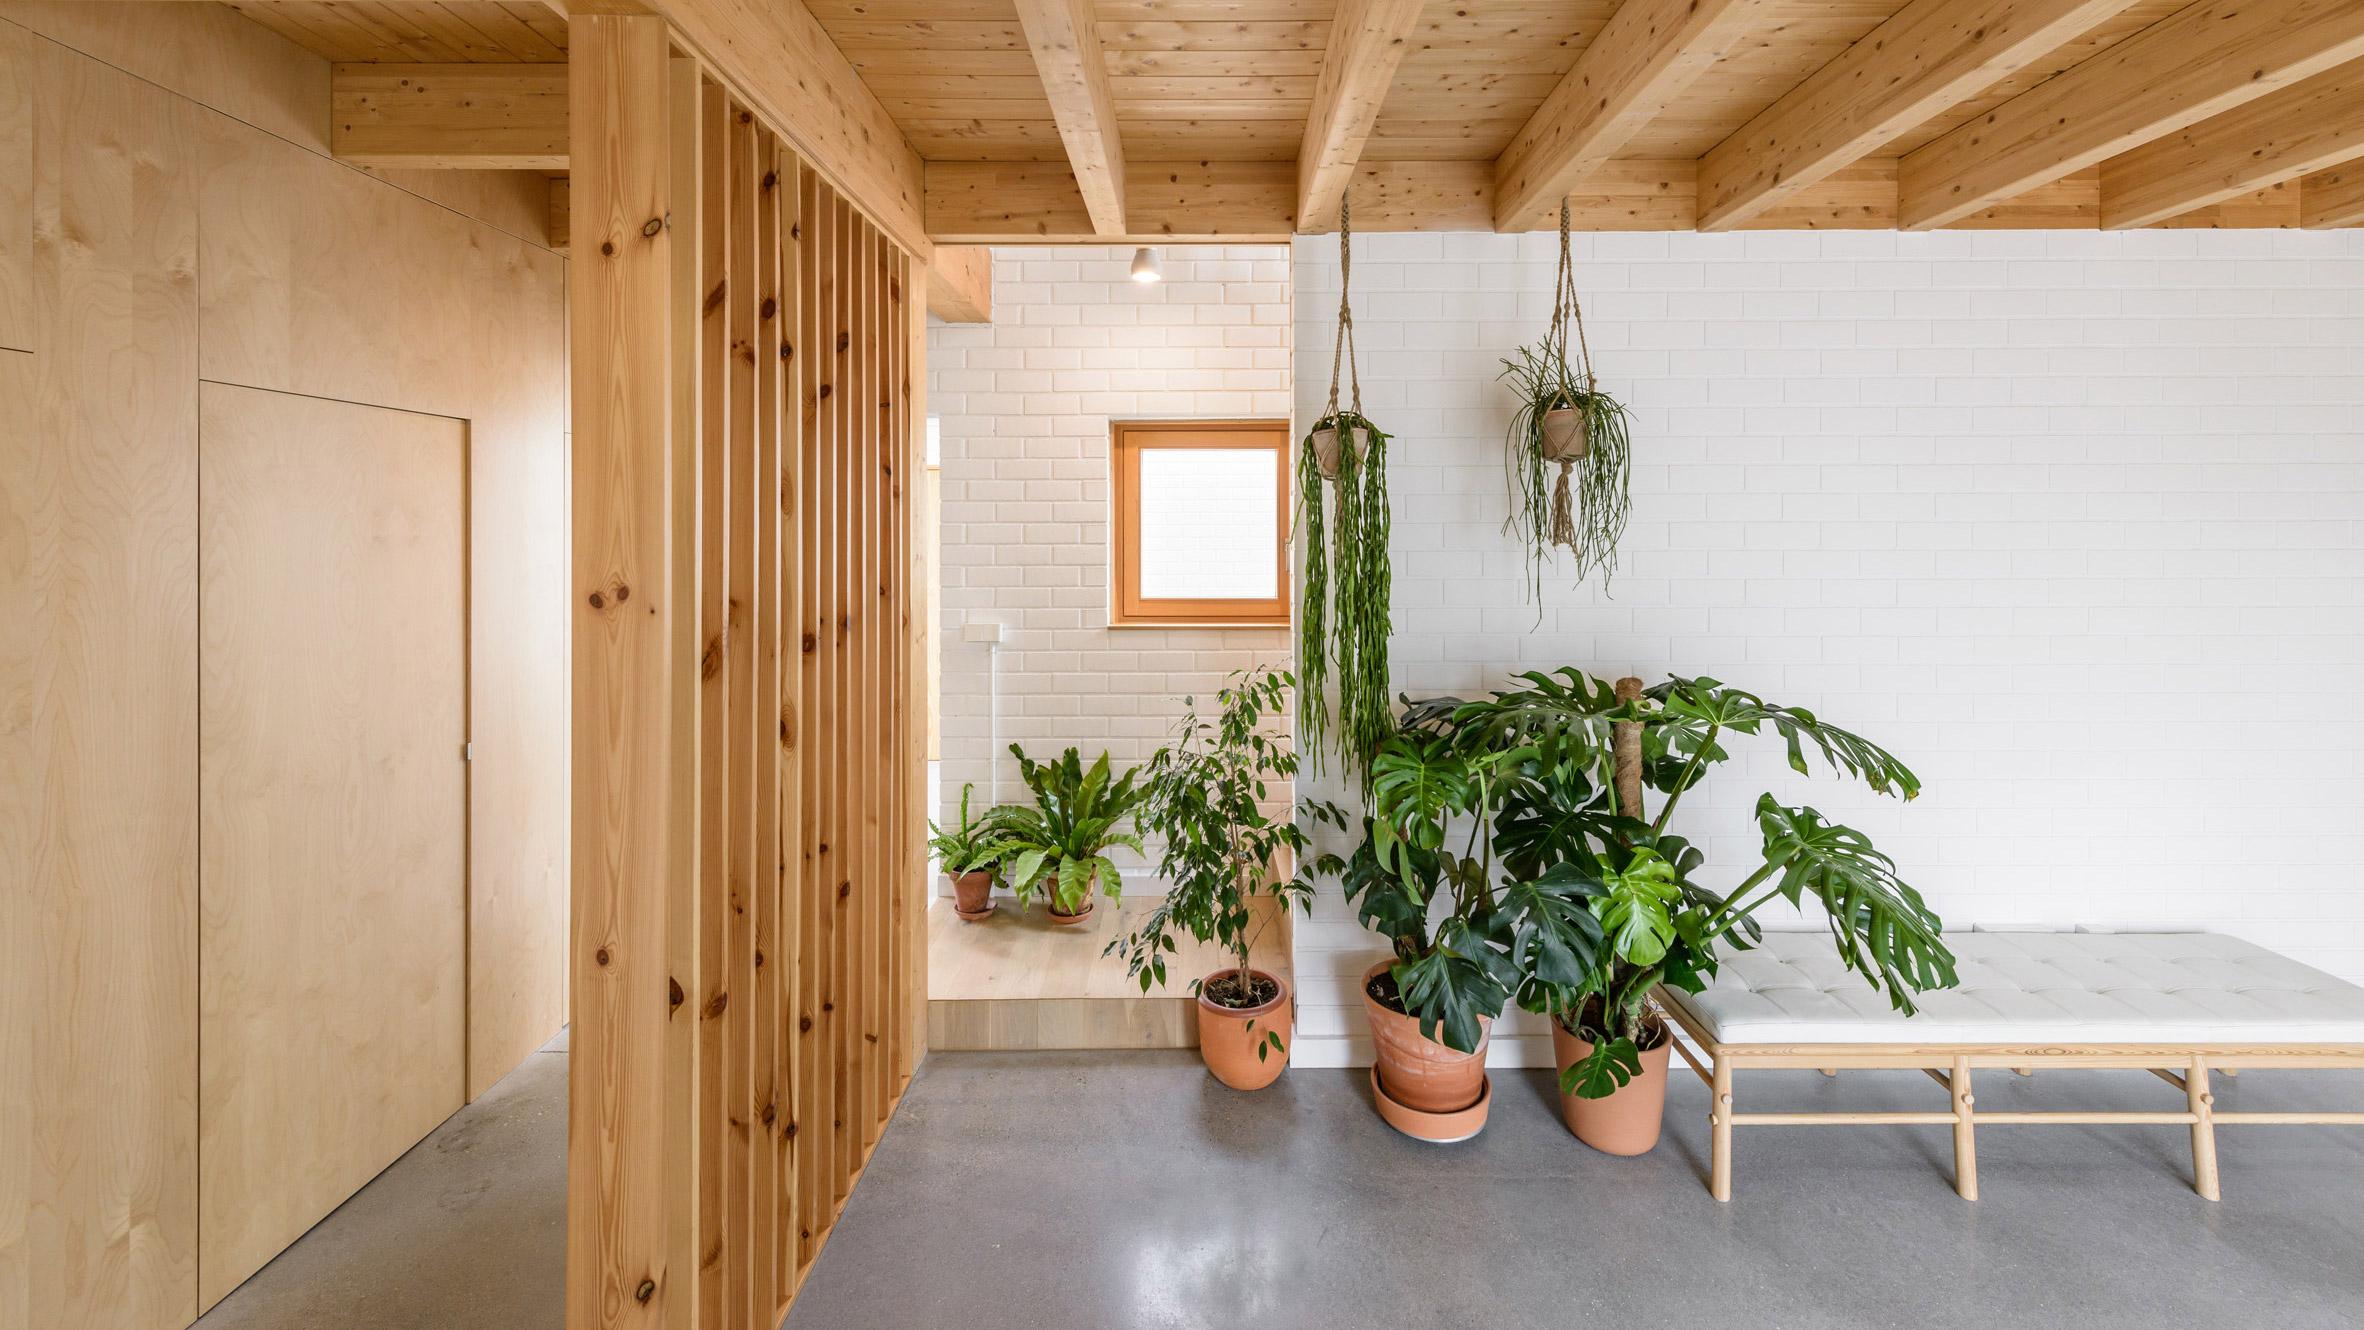 Plant-filled interior